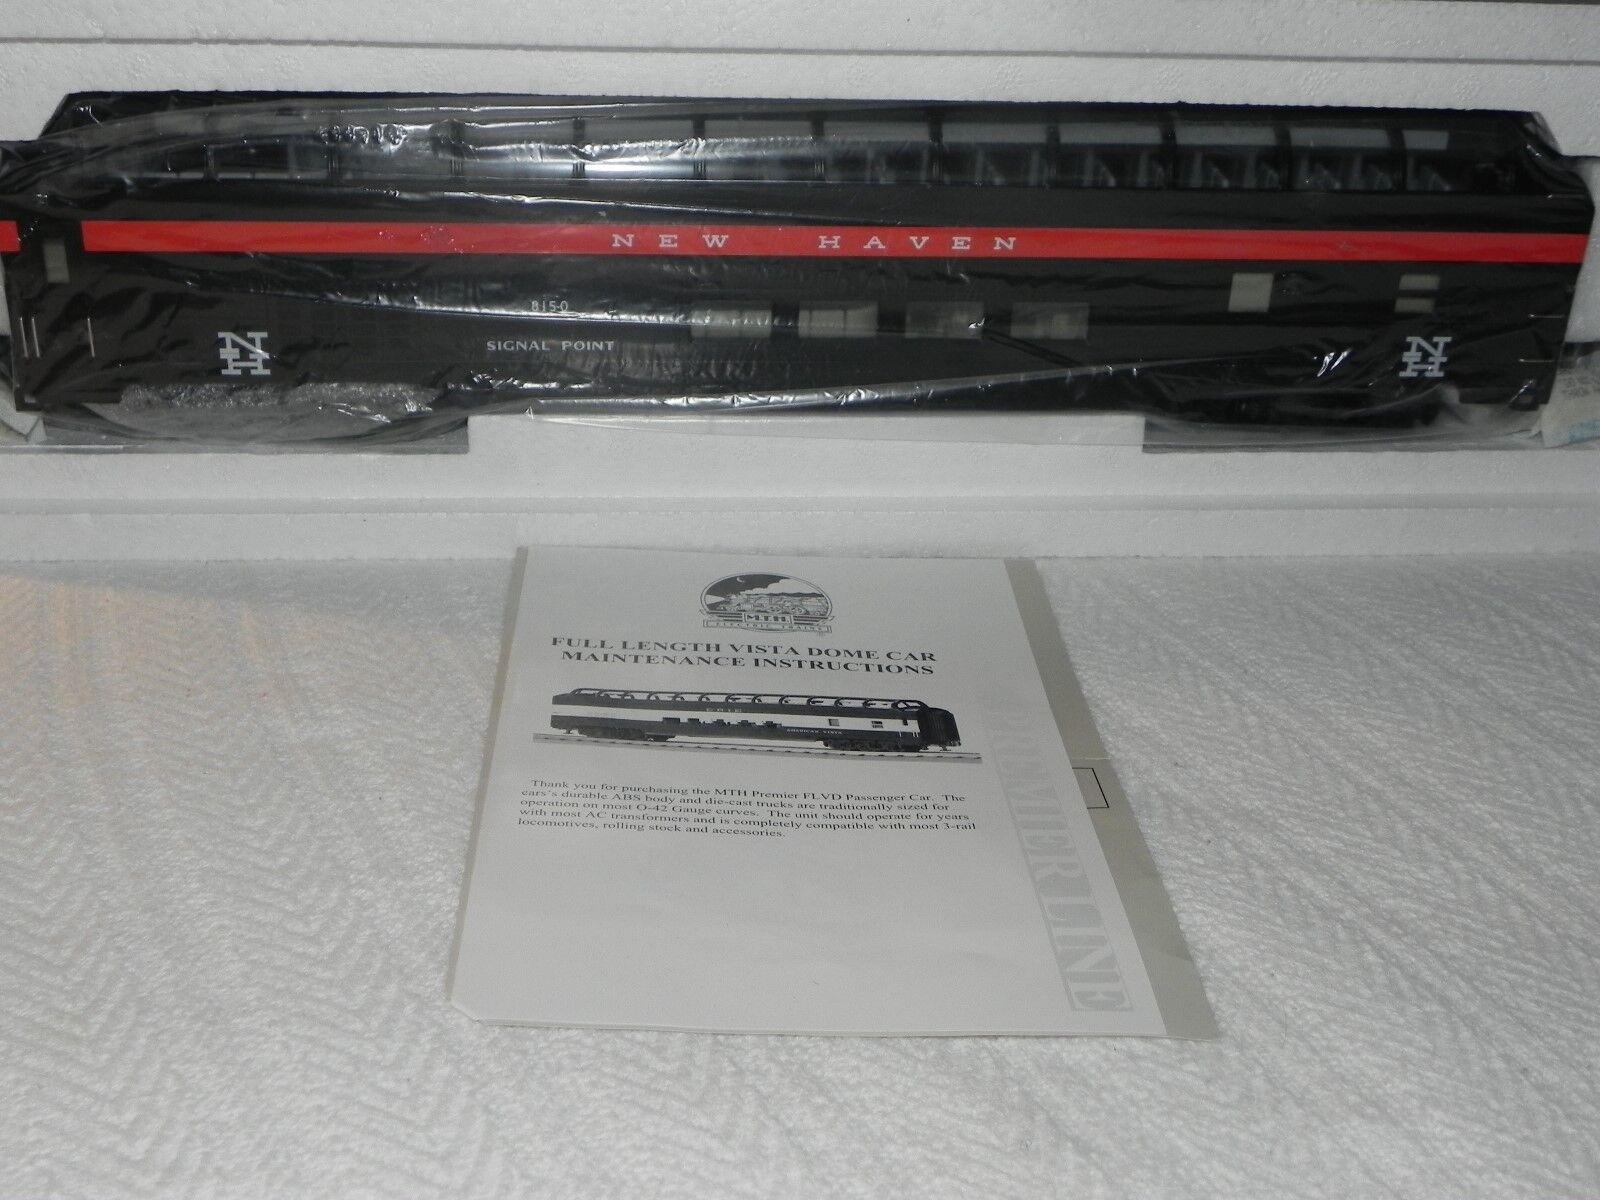 MTH 20-6762 New Haven 70' ABS longitud total coche pasajeros de cúpula de vista [] Suave